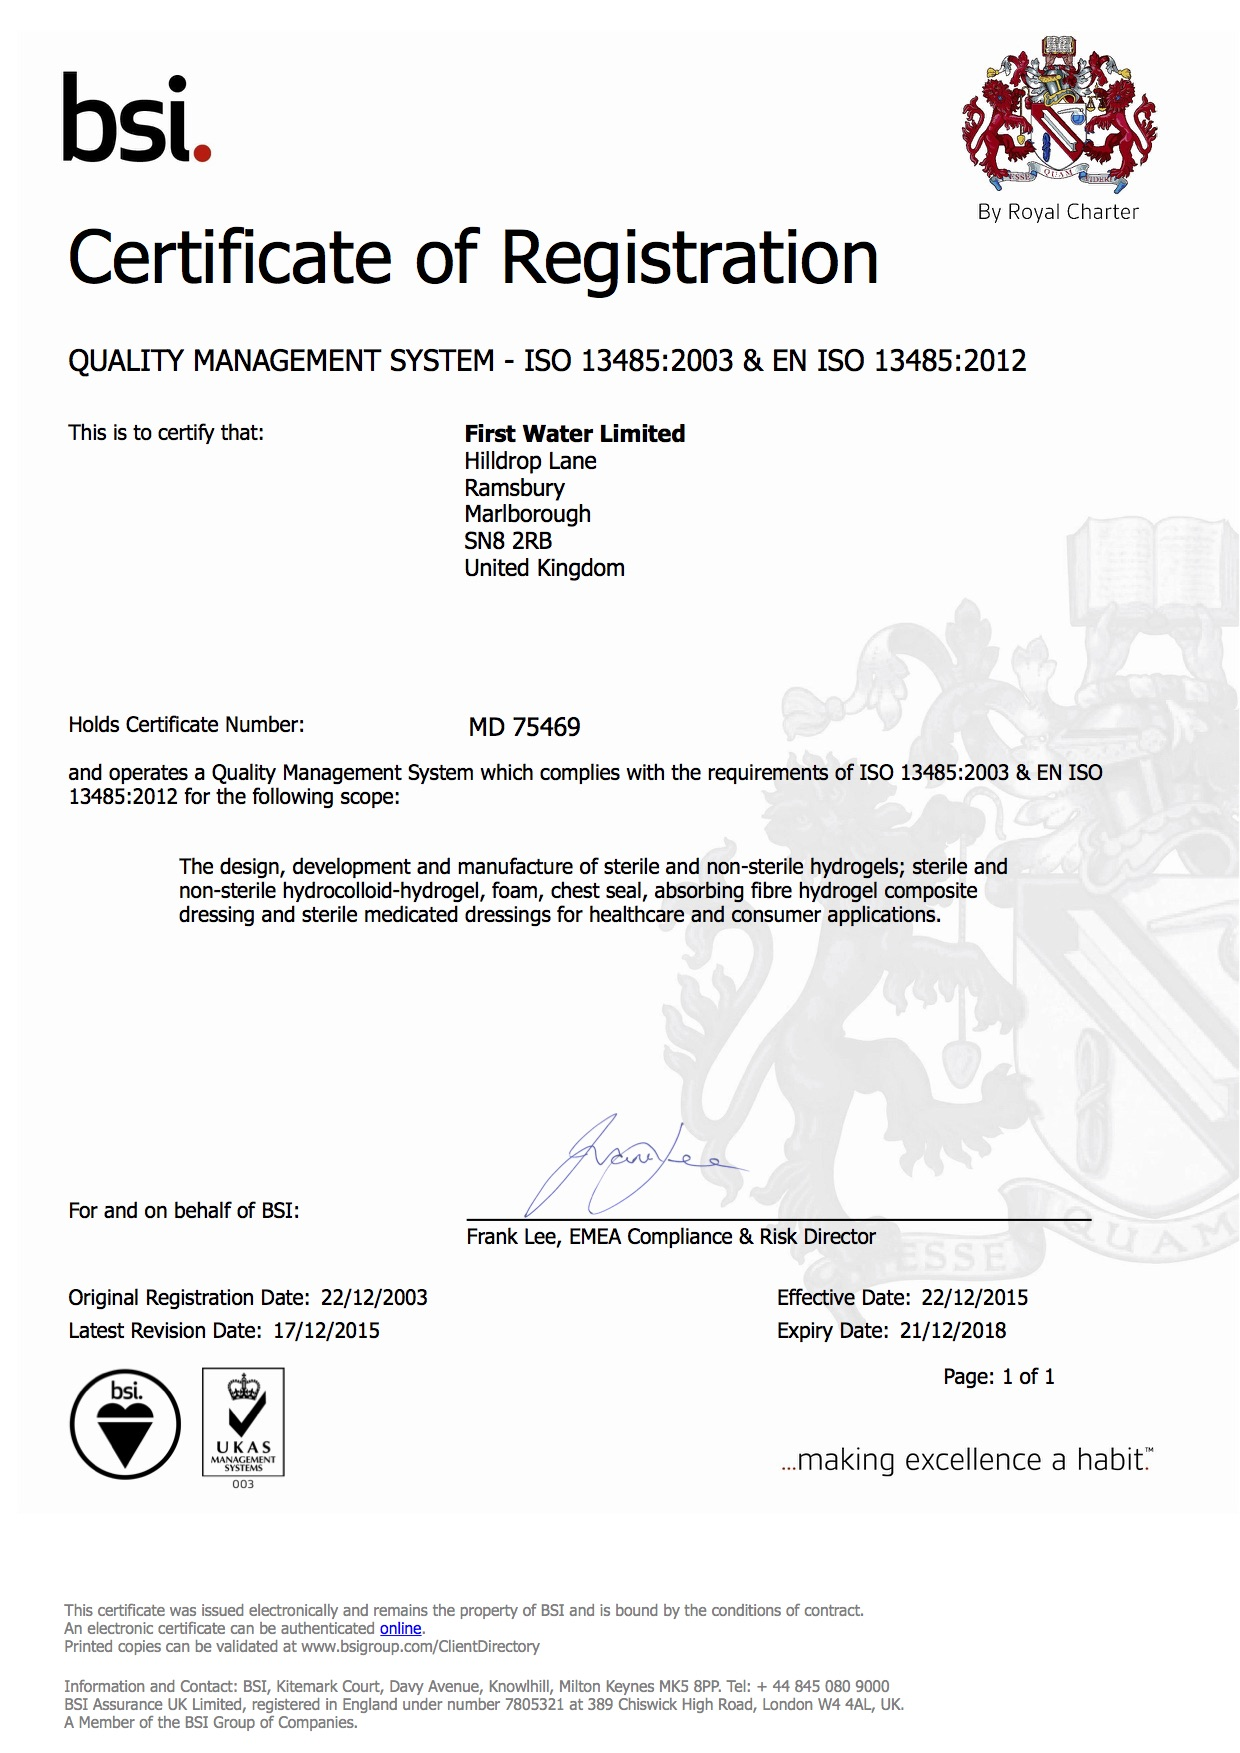 ISO 13485 MD 75469 [1].jpg